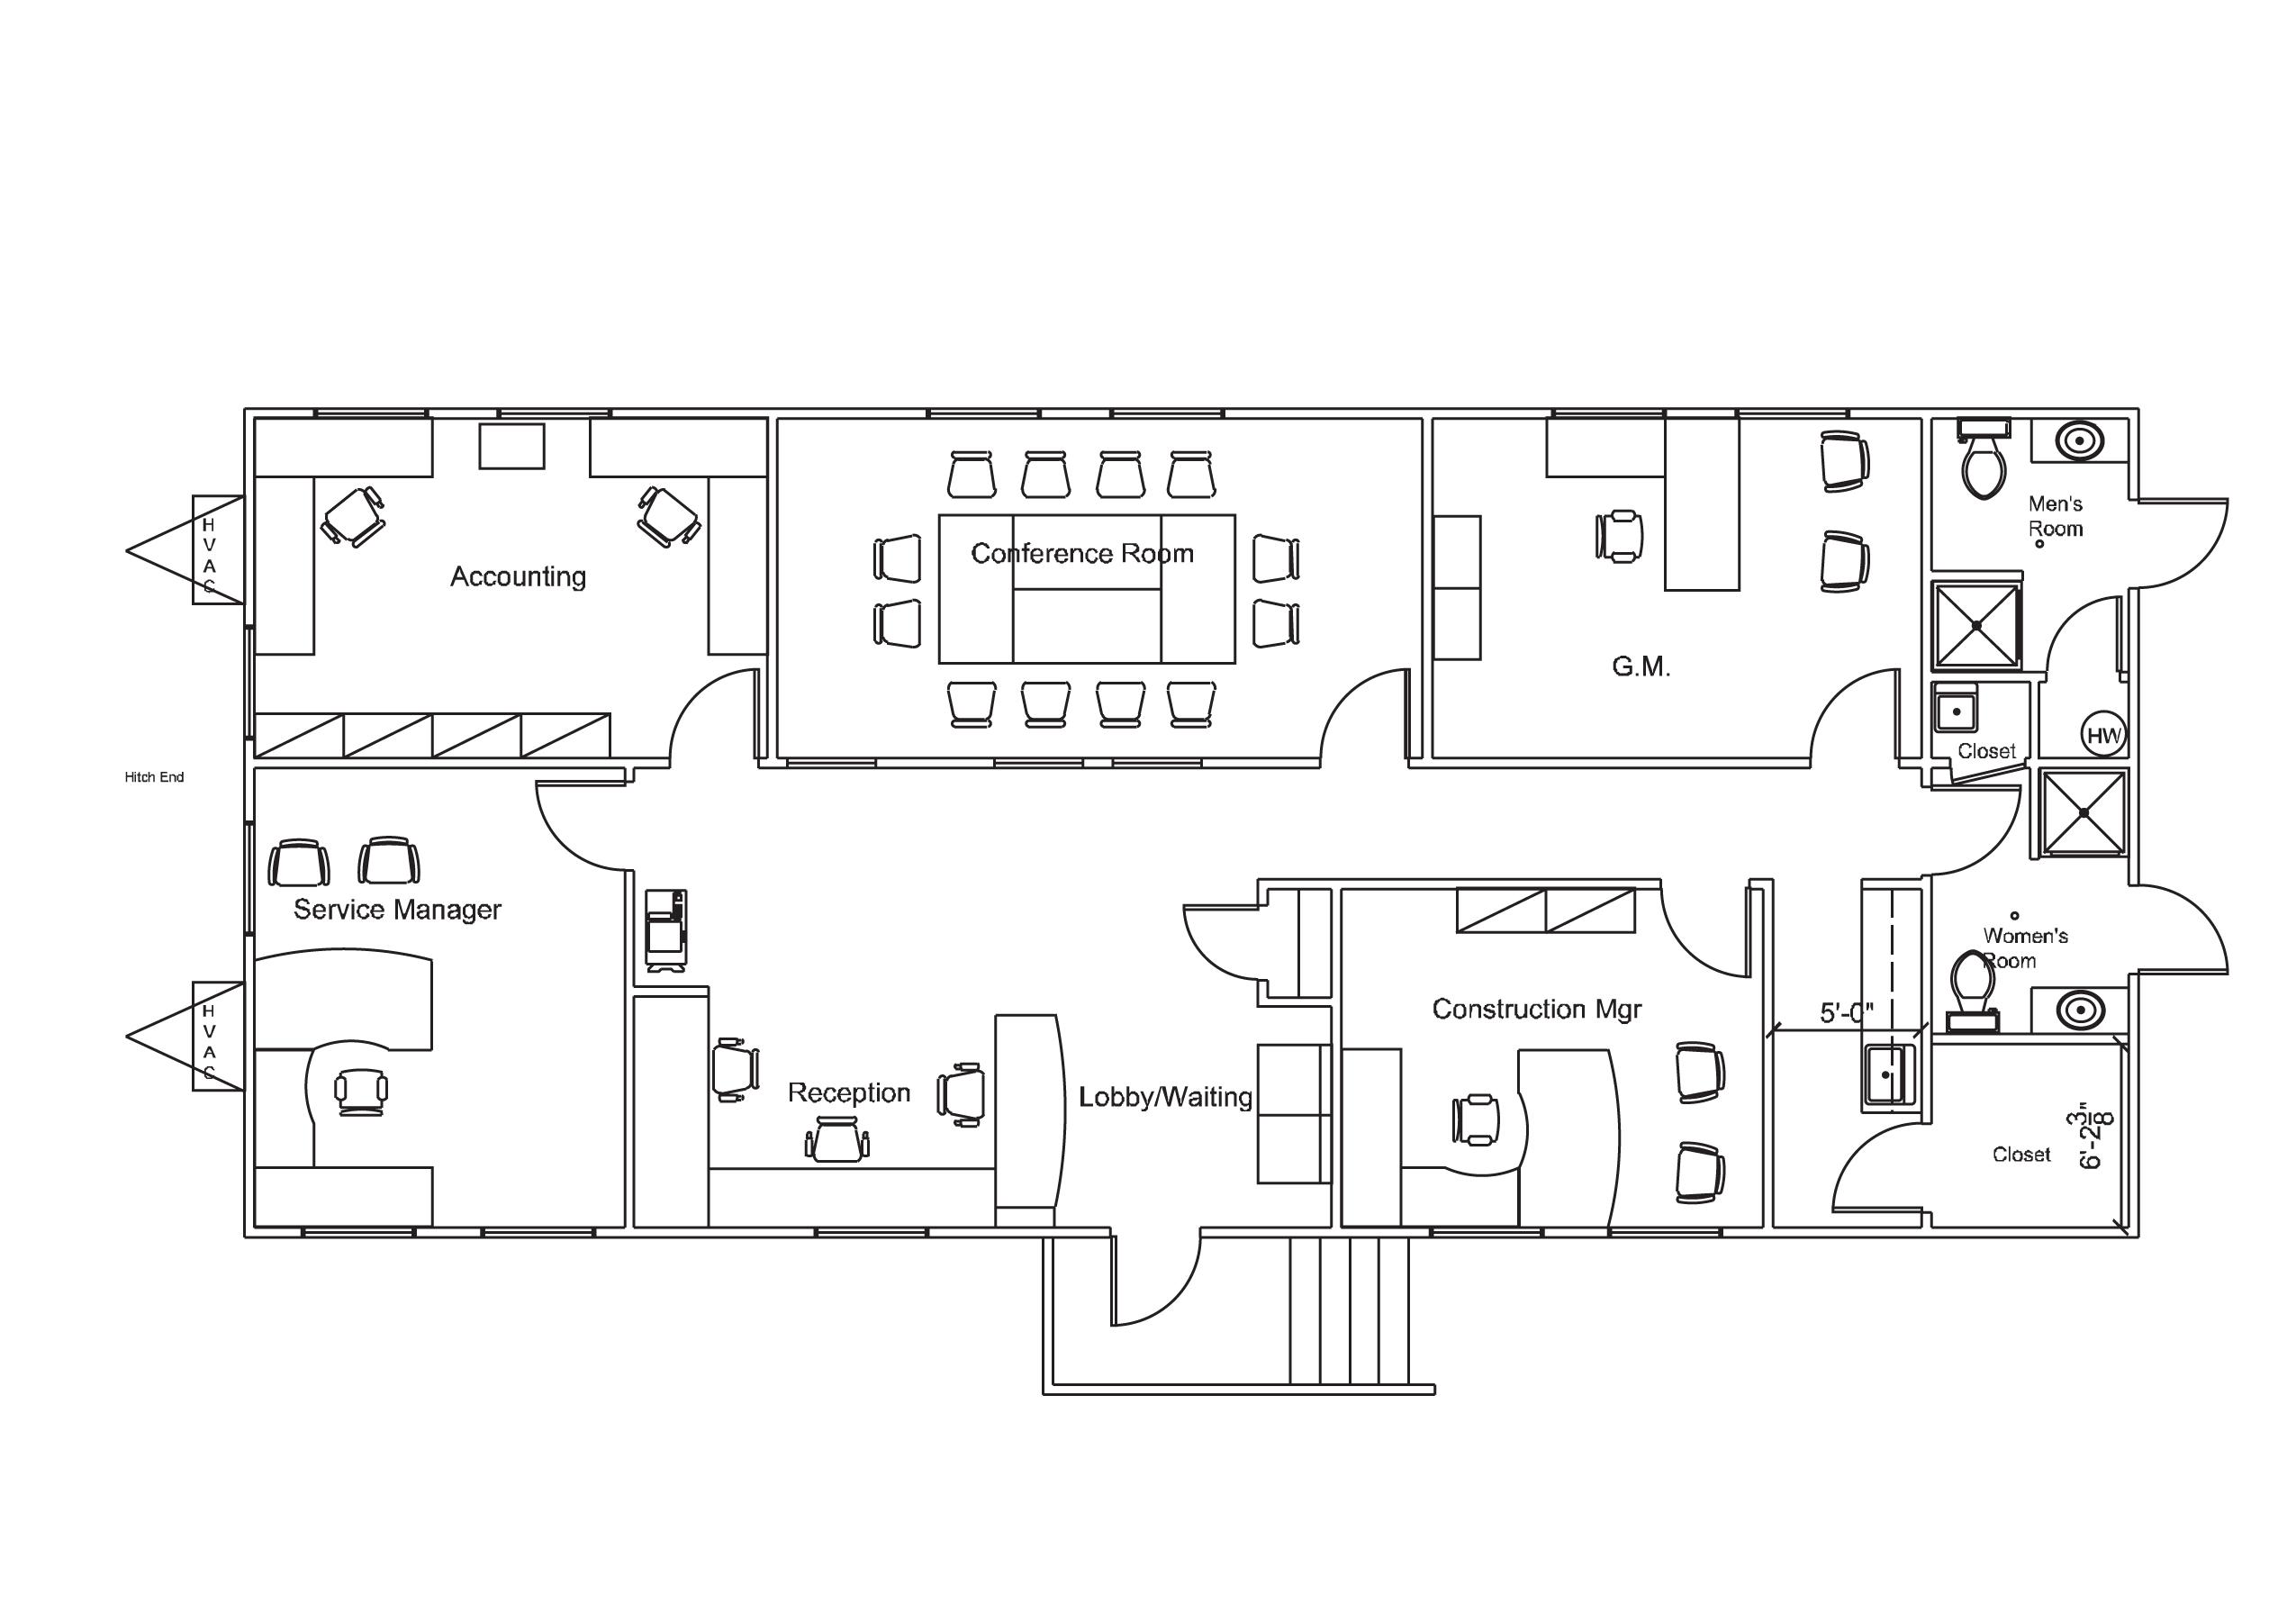 Modular Building Drawing 2